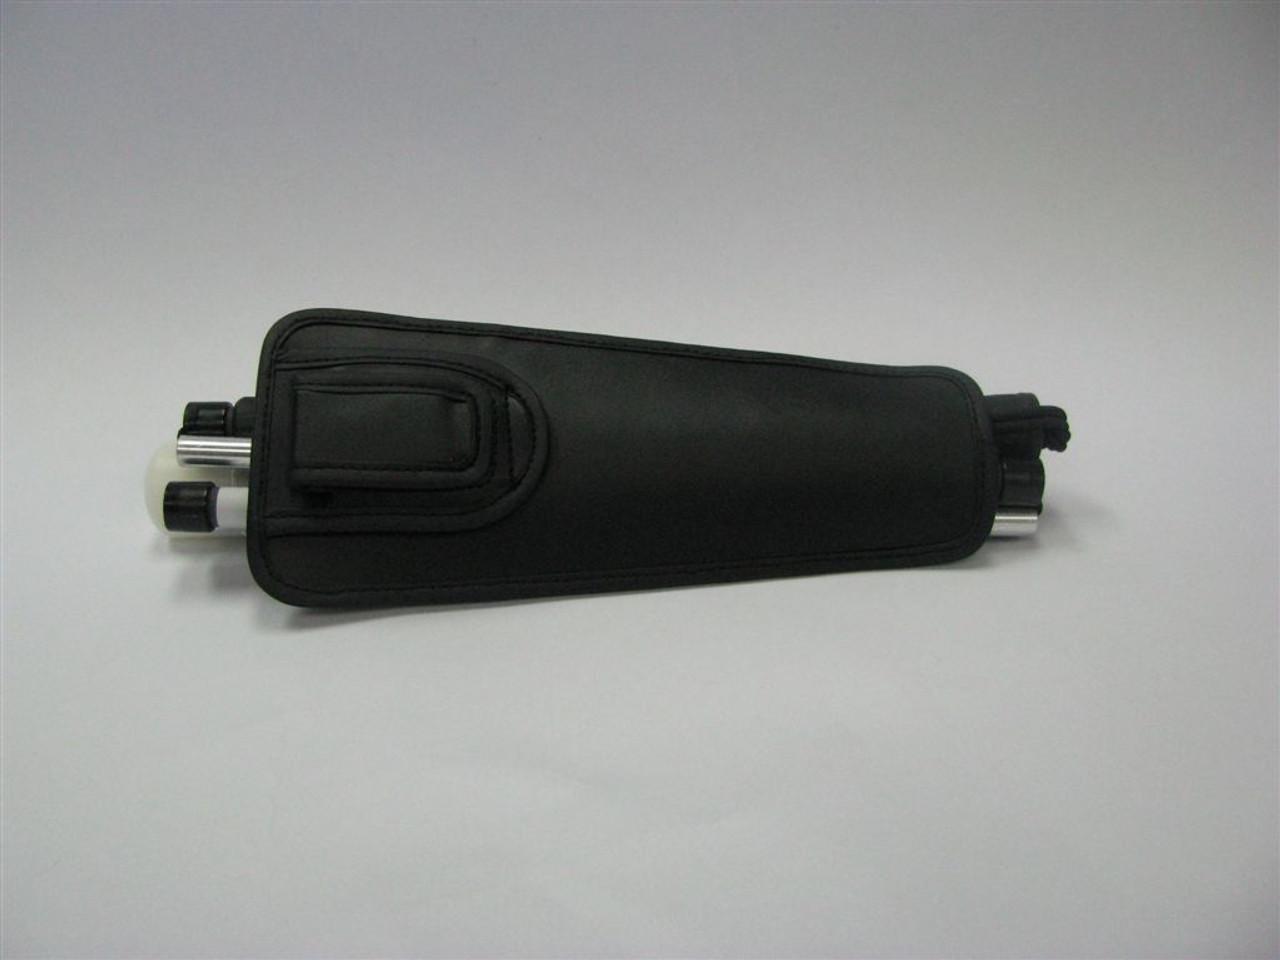 Ambutech Cane Holster - Black Leather